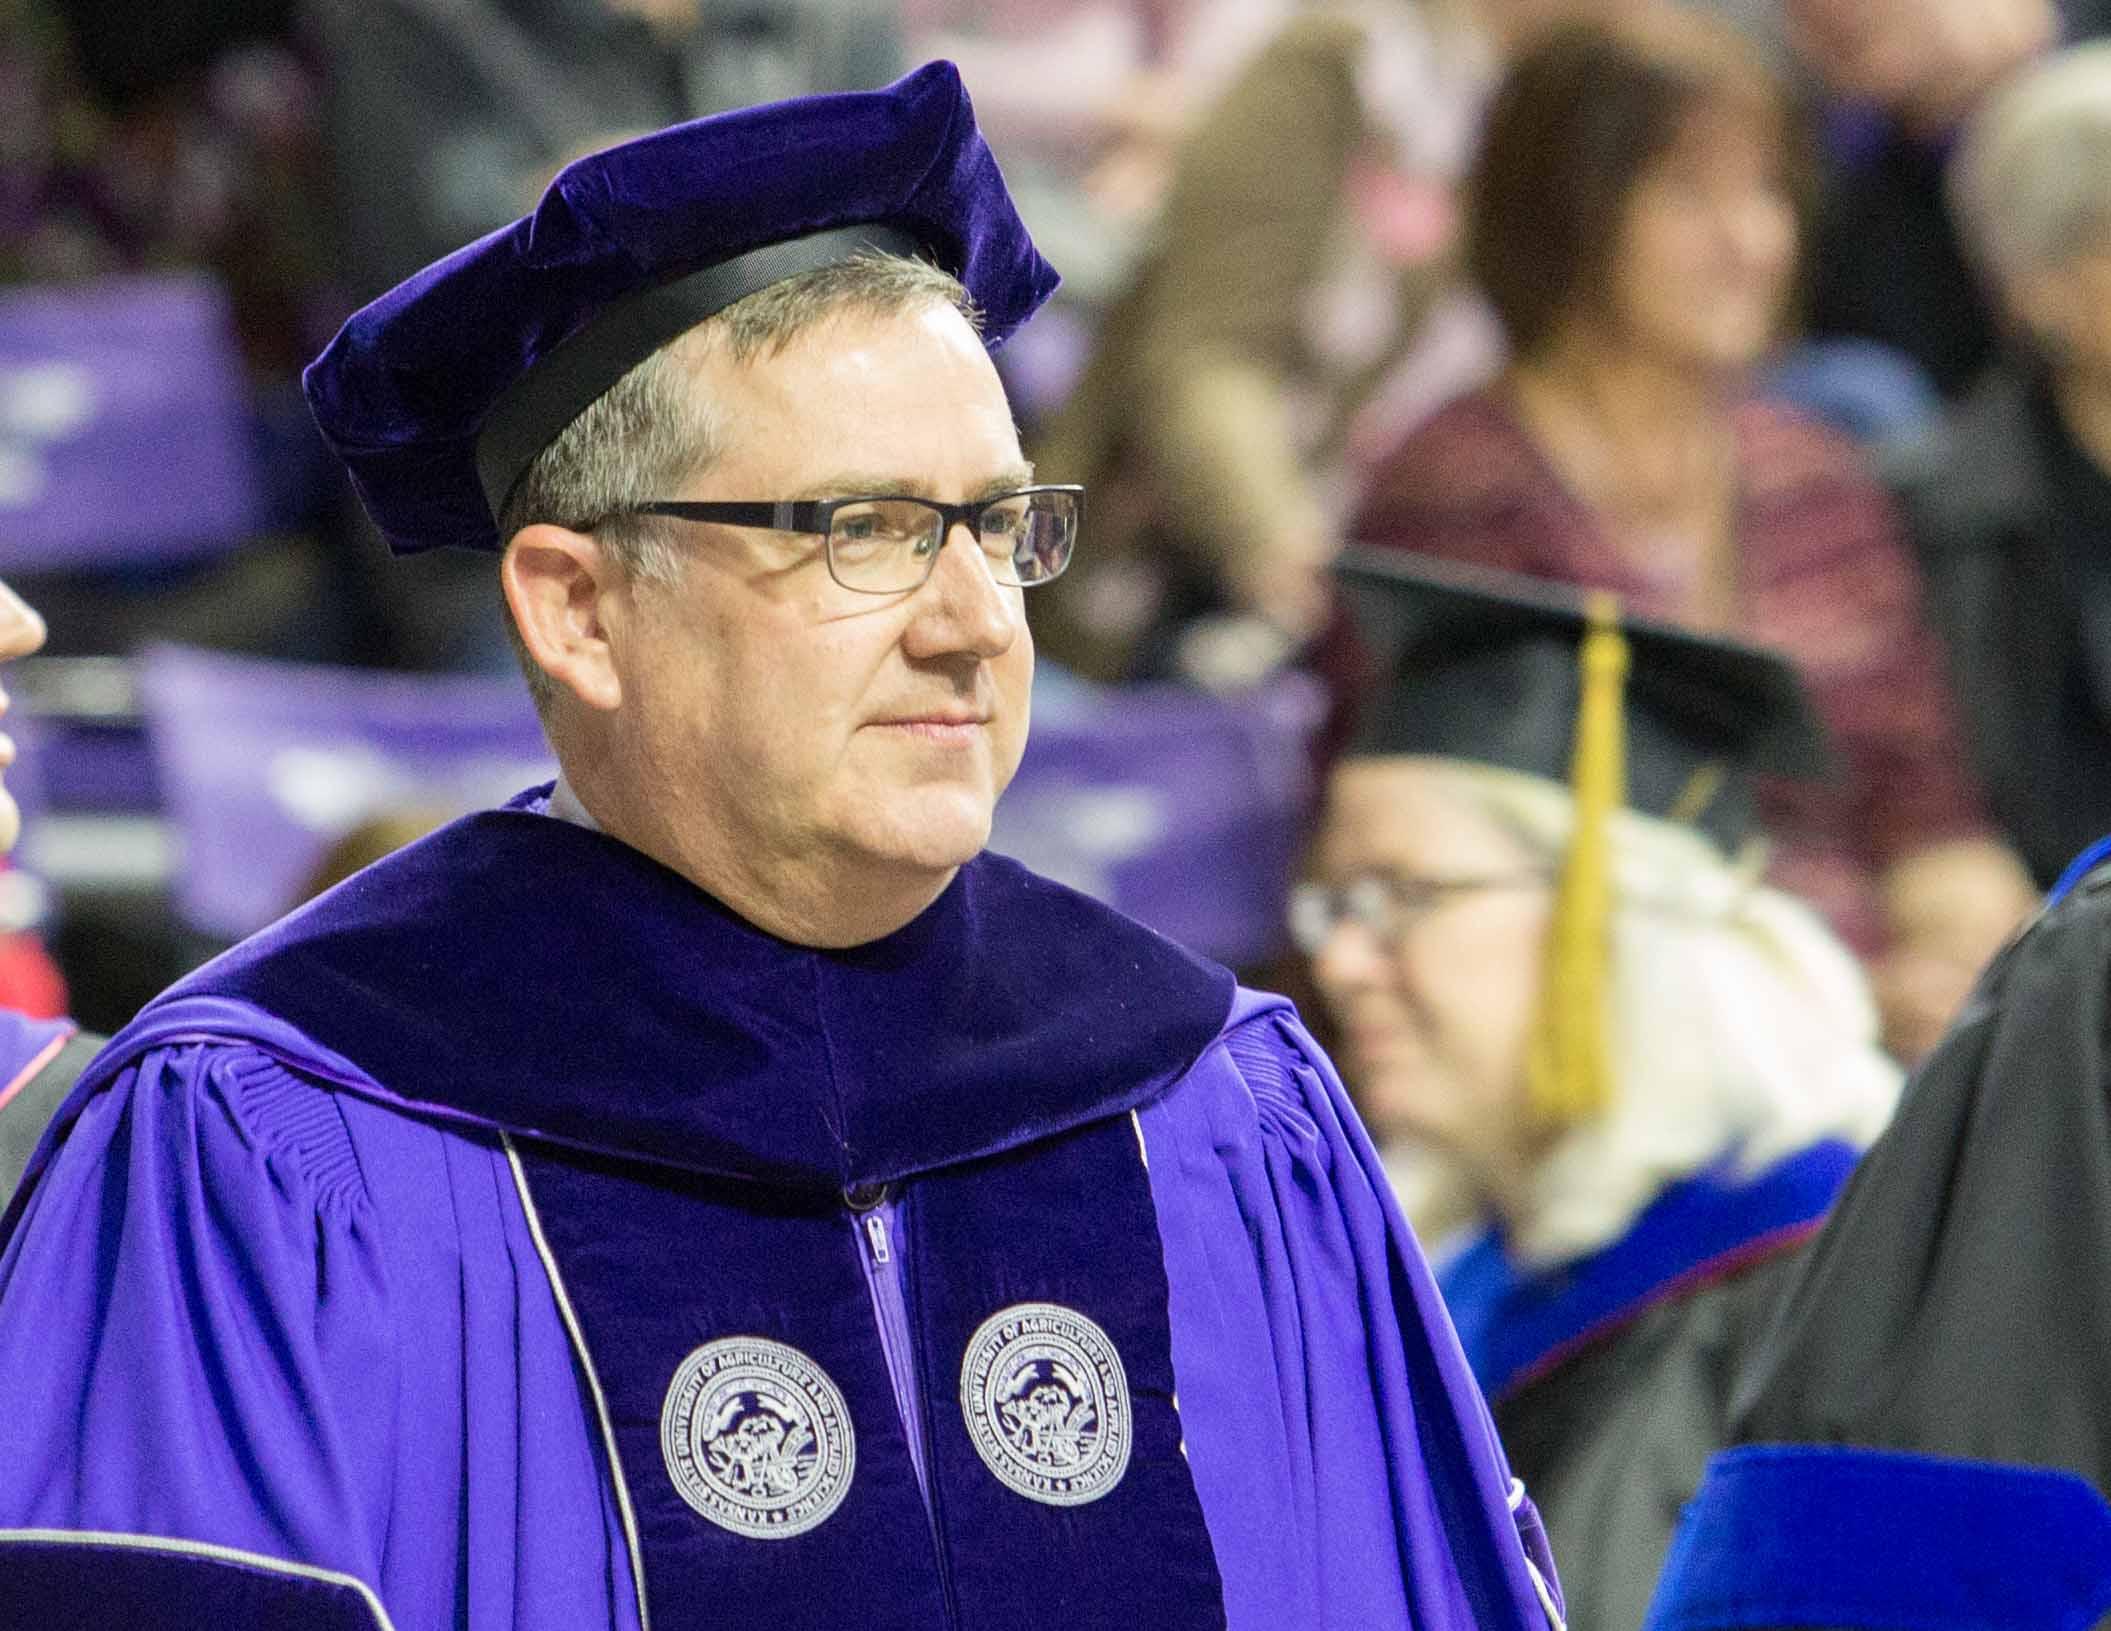 President Kirk Schulz